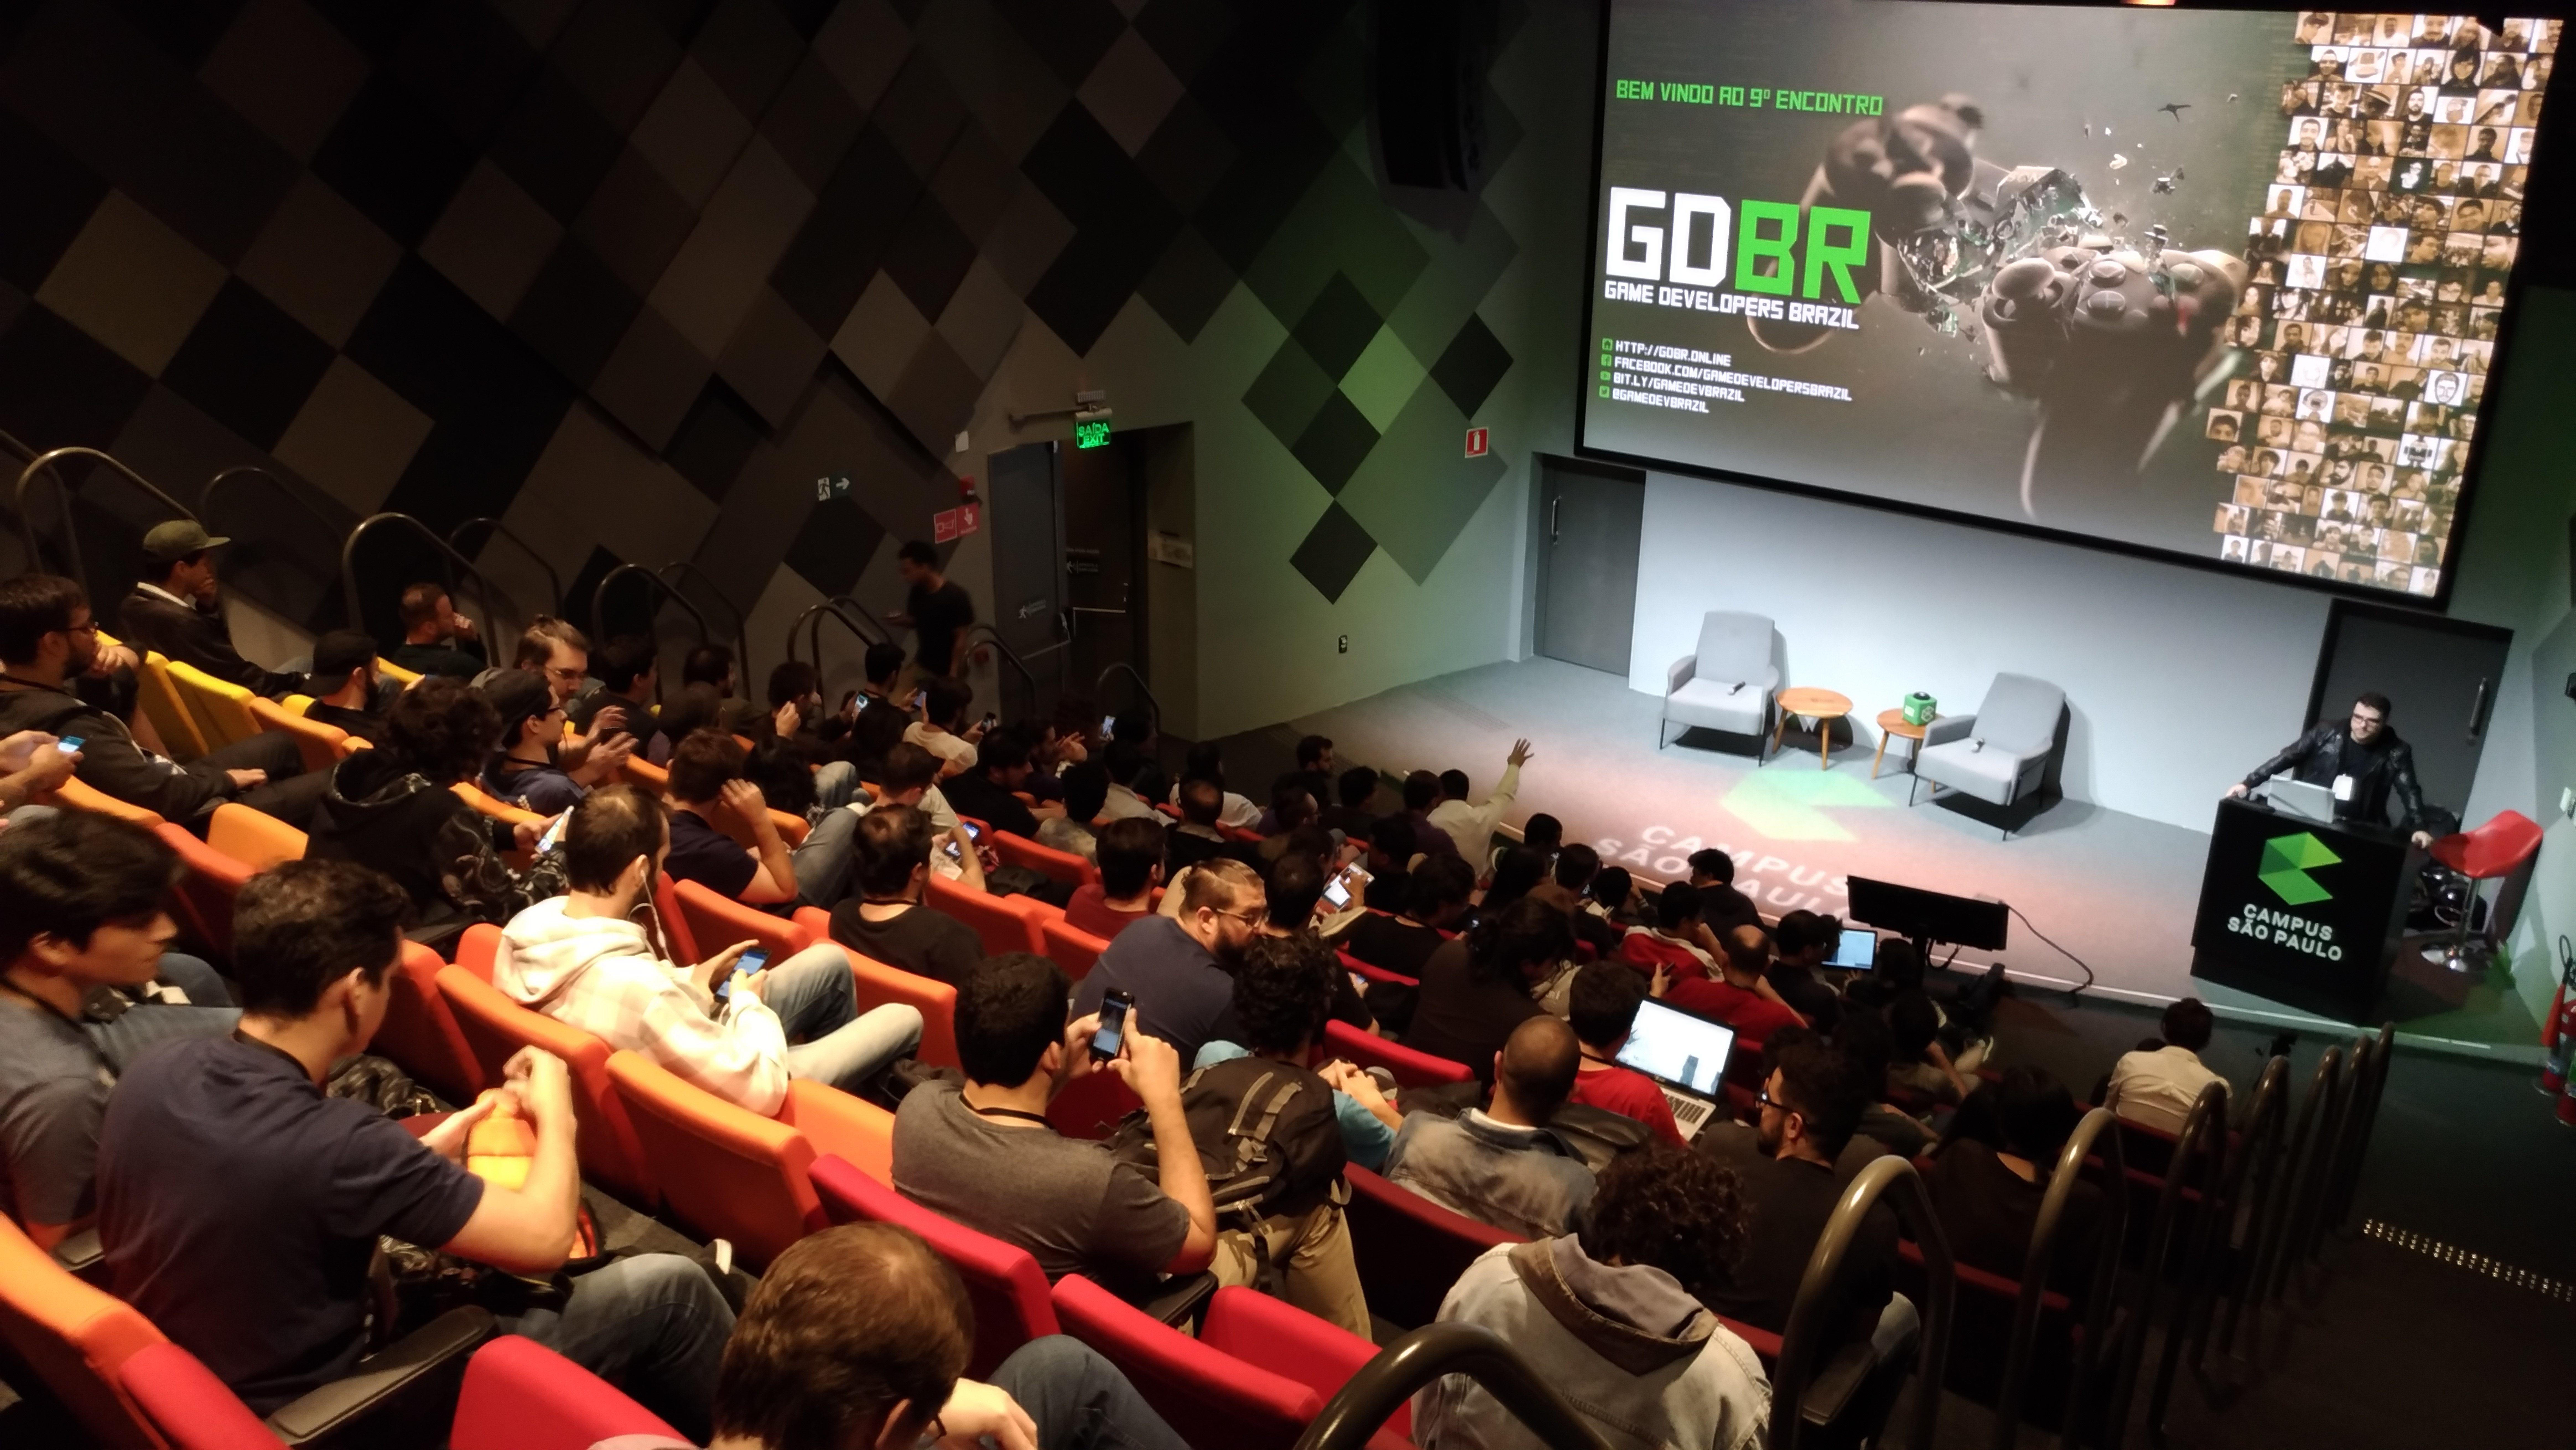 GDBR - Game Developers Brazil